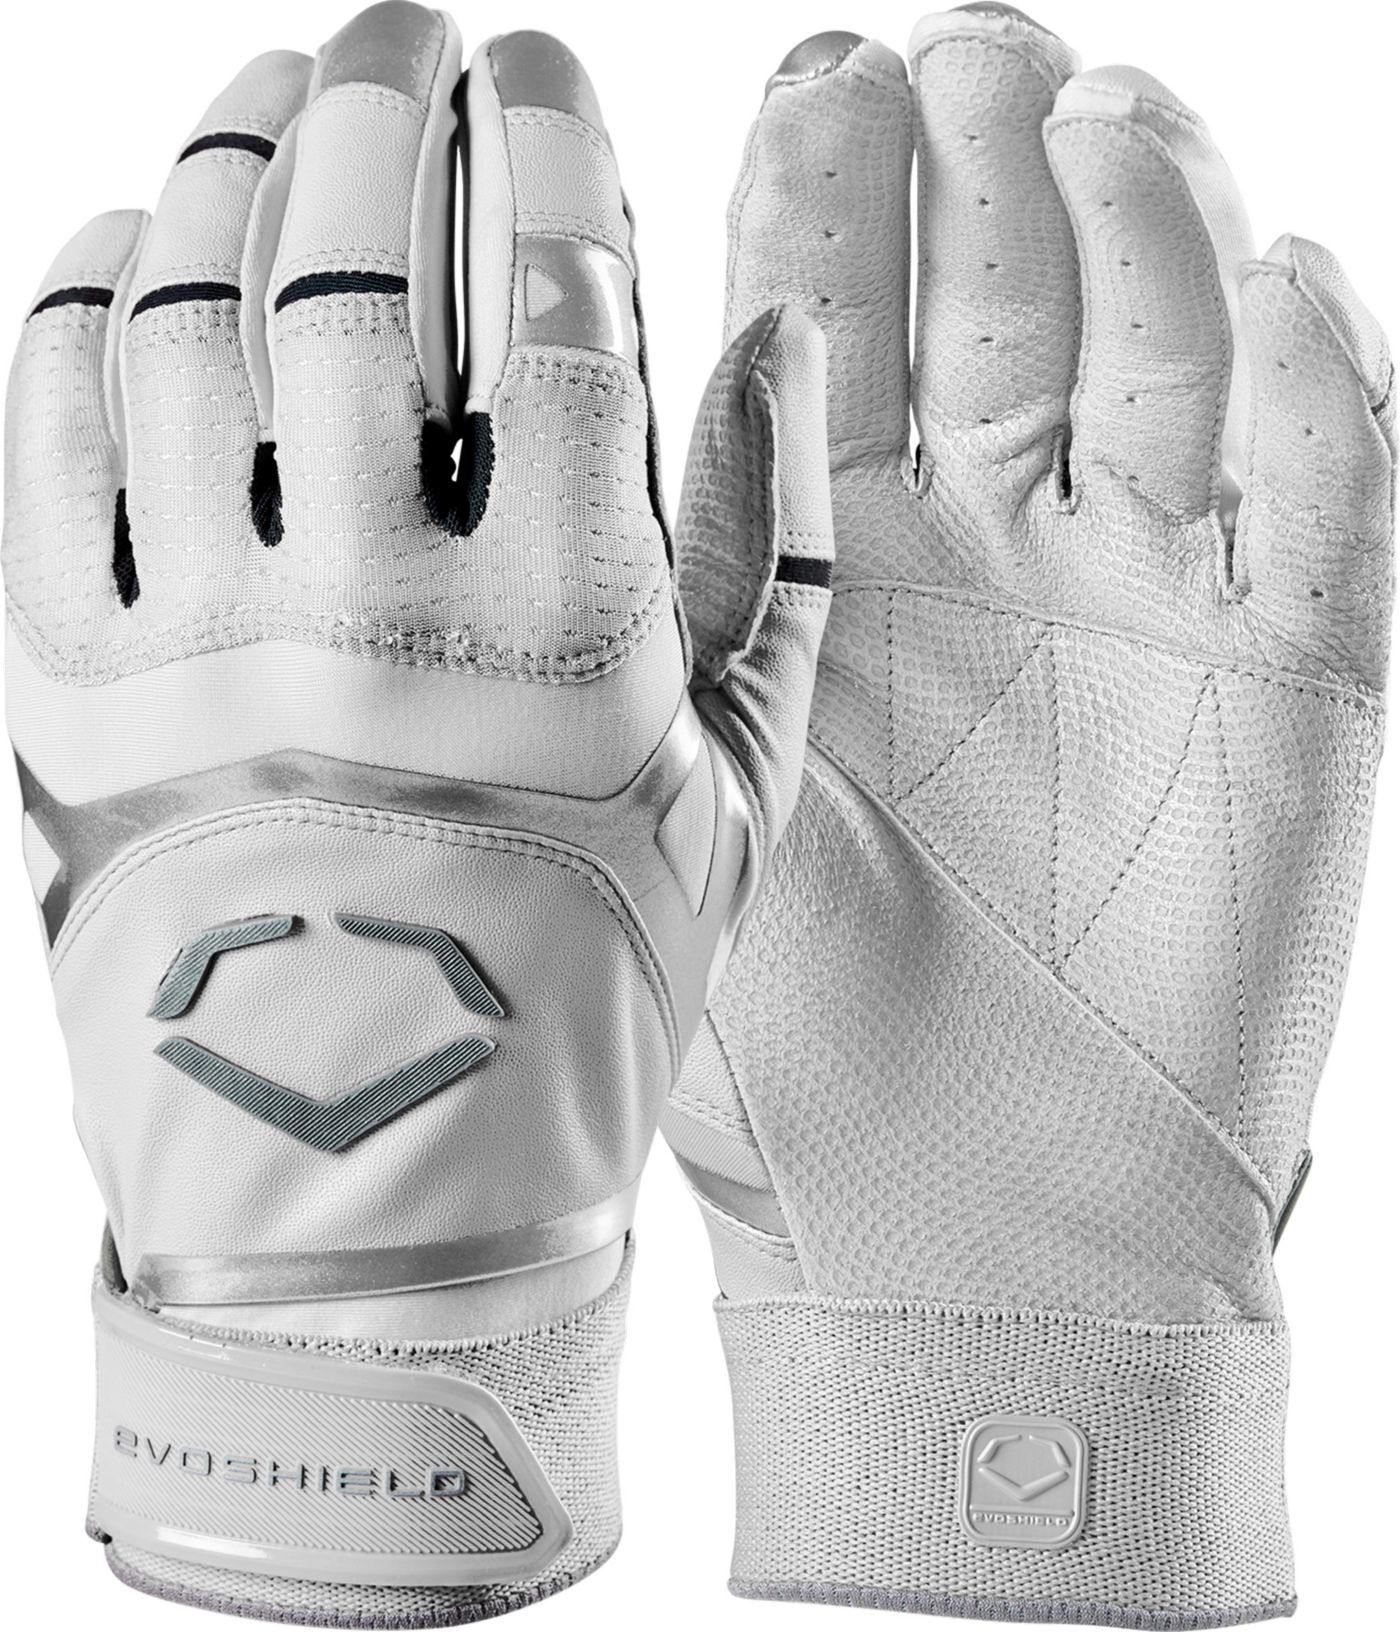 EvoShield Adult XGT G2S Batting Gloves